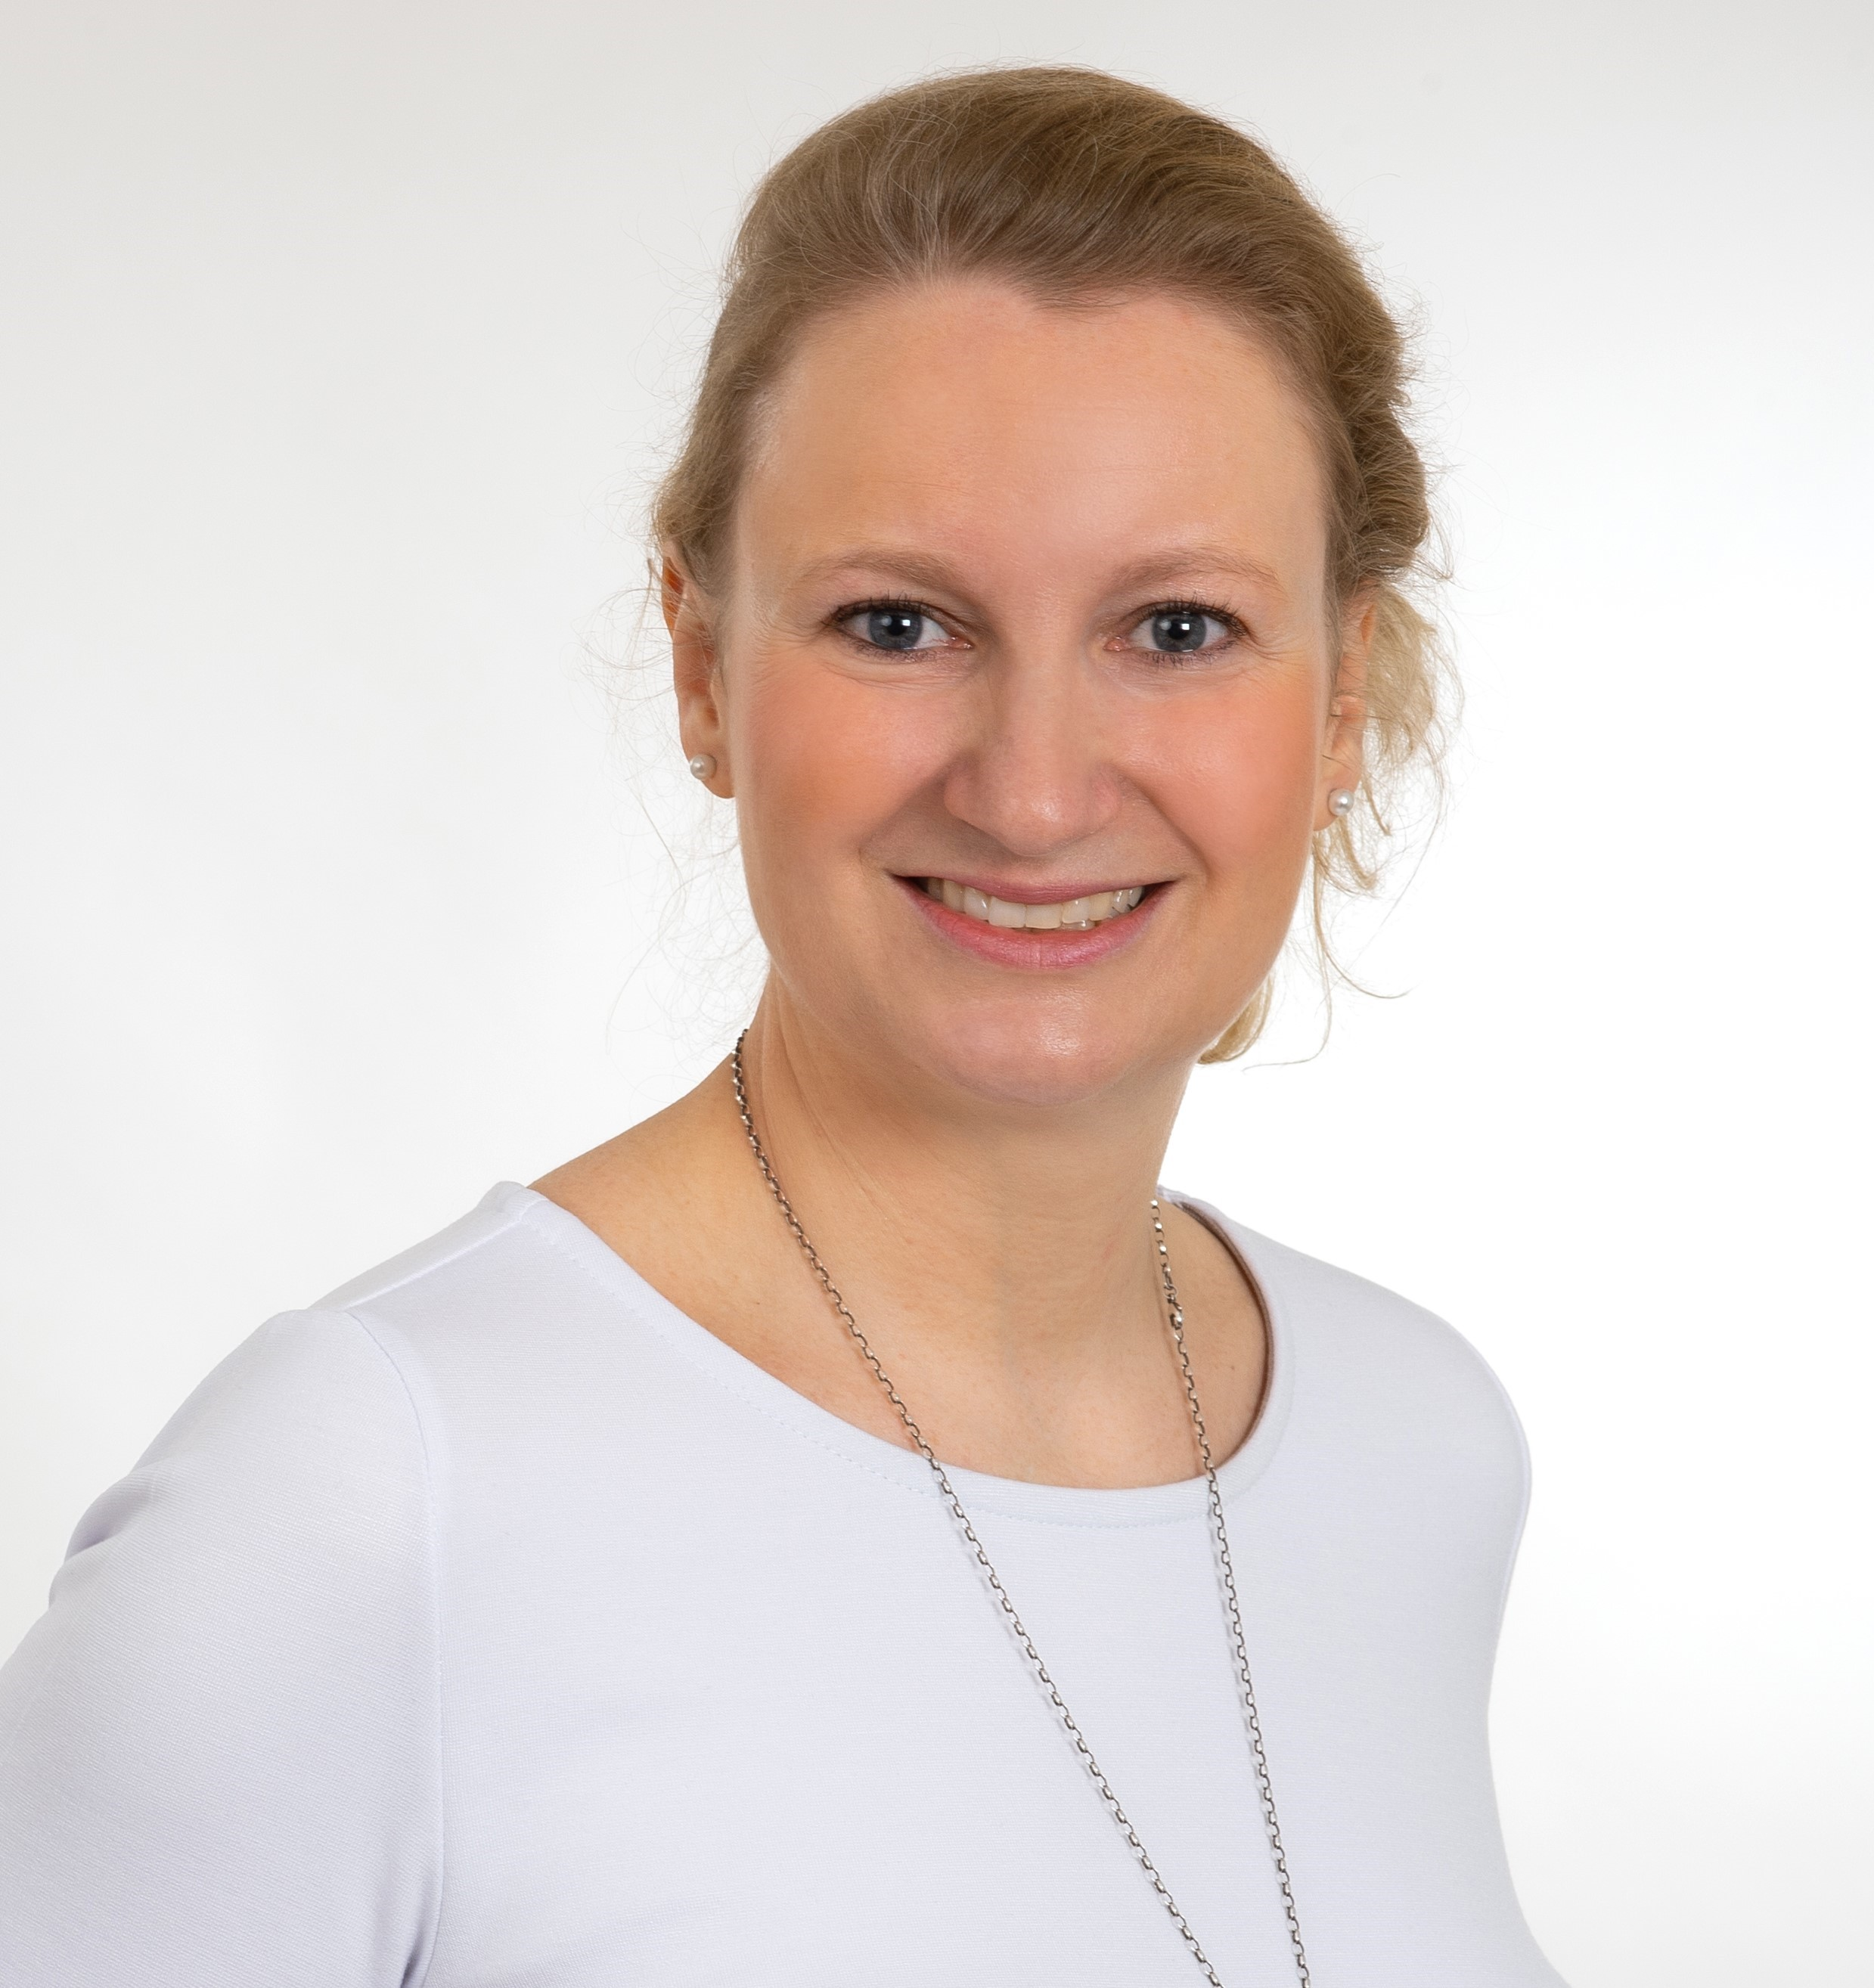 Linda Gräber